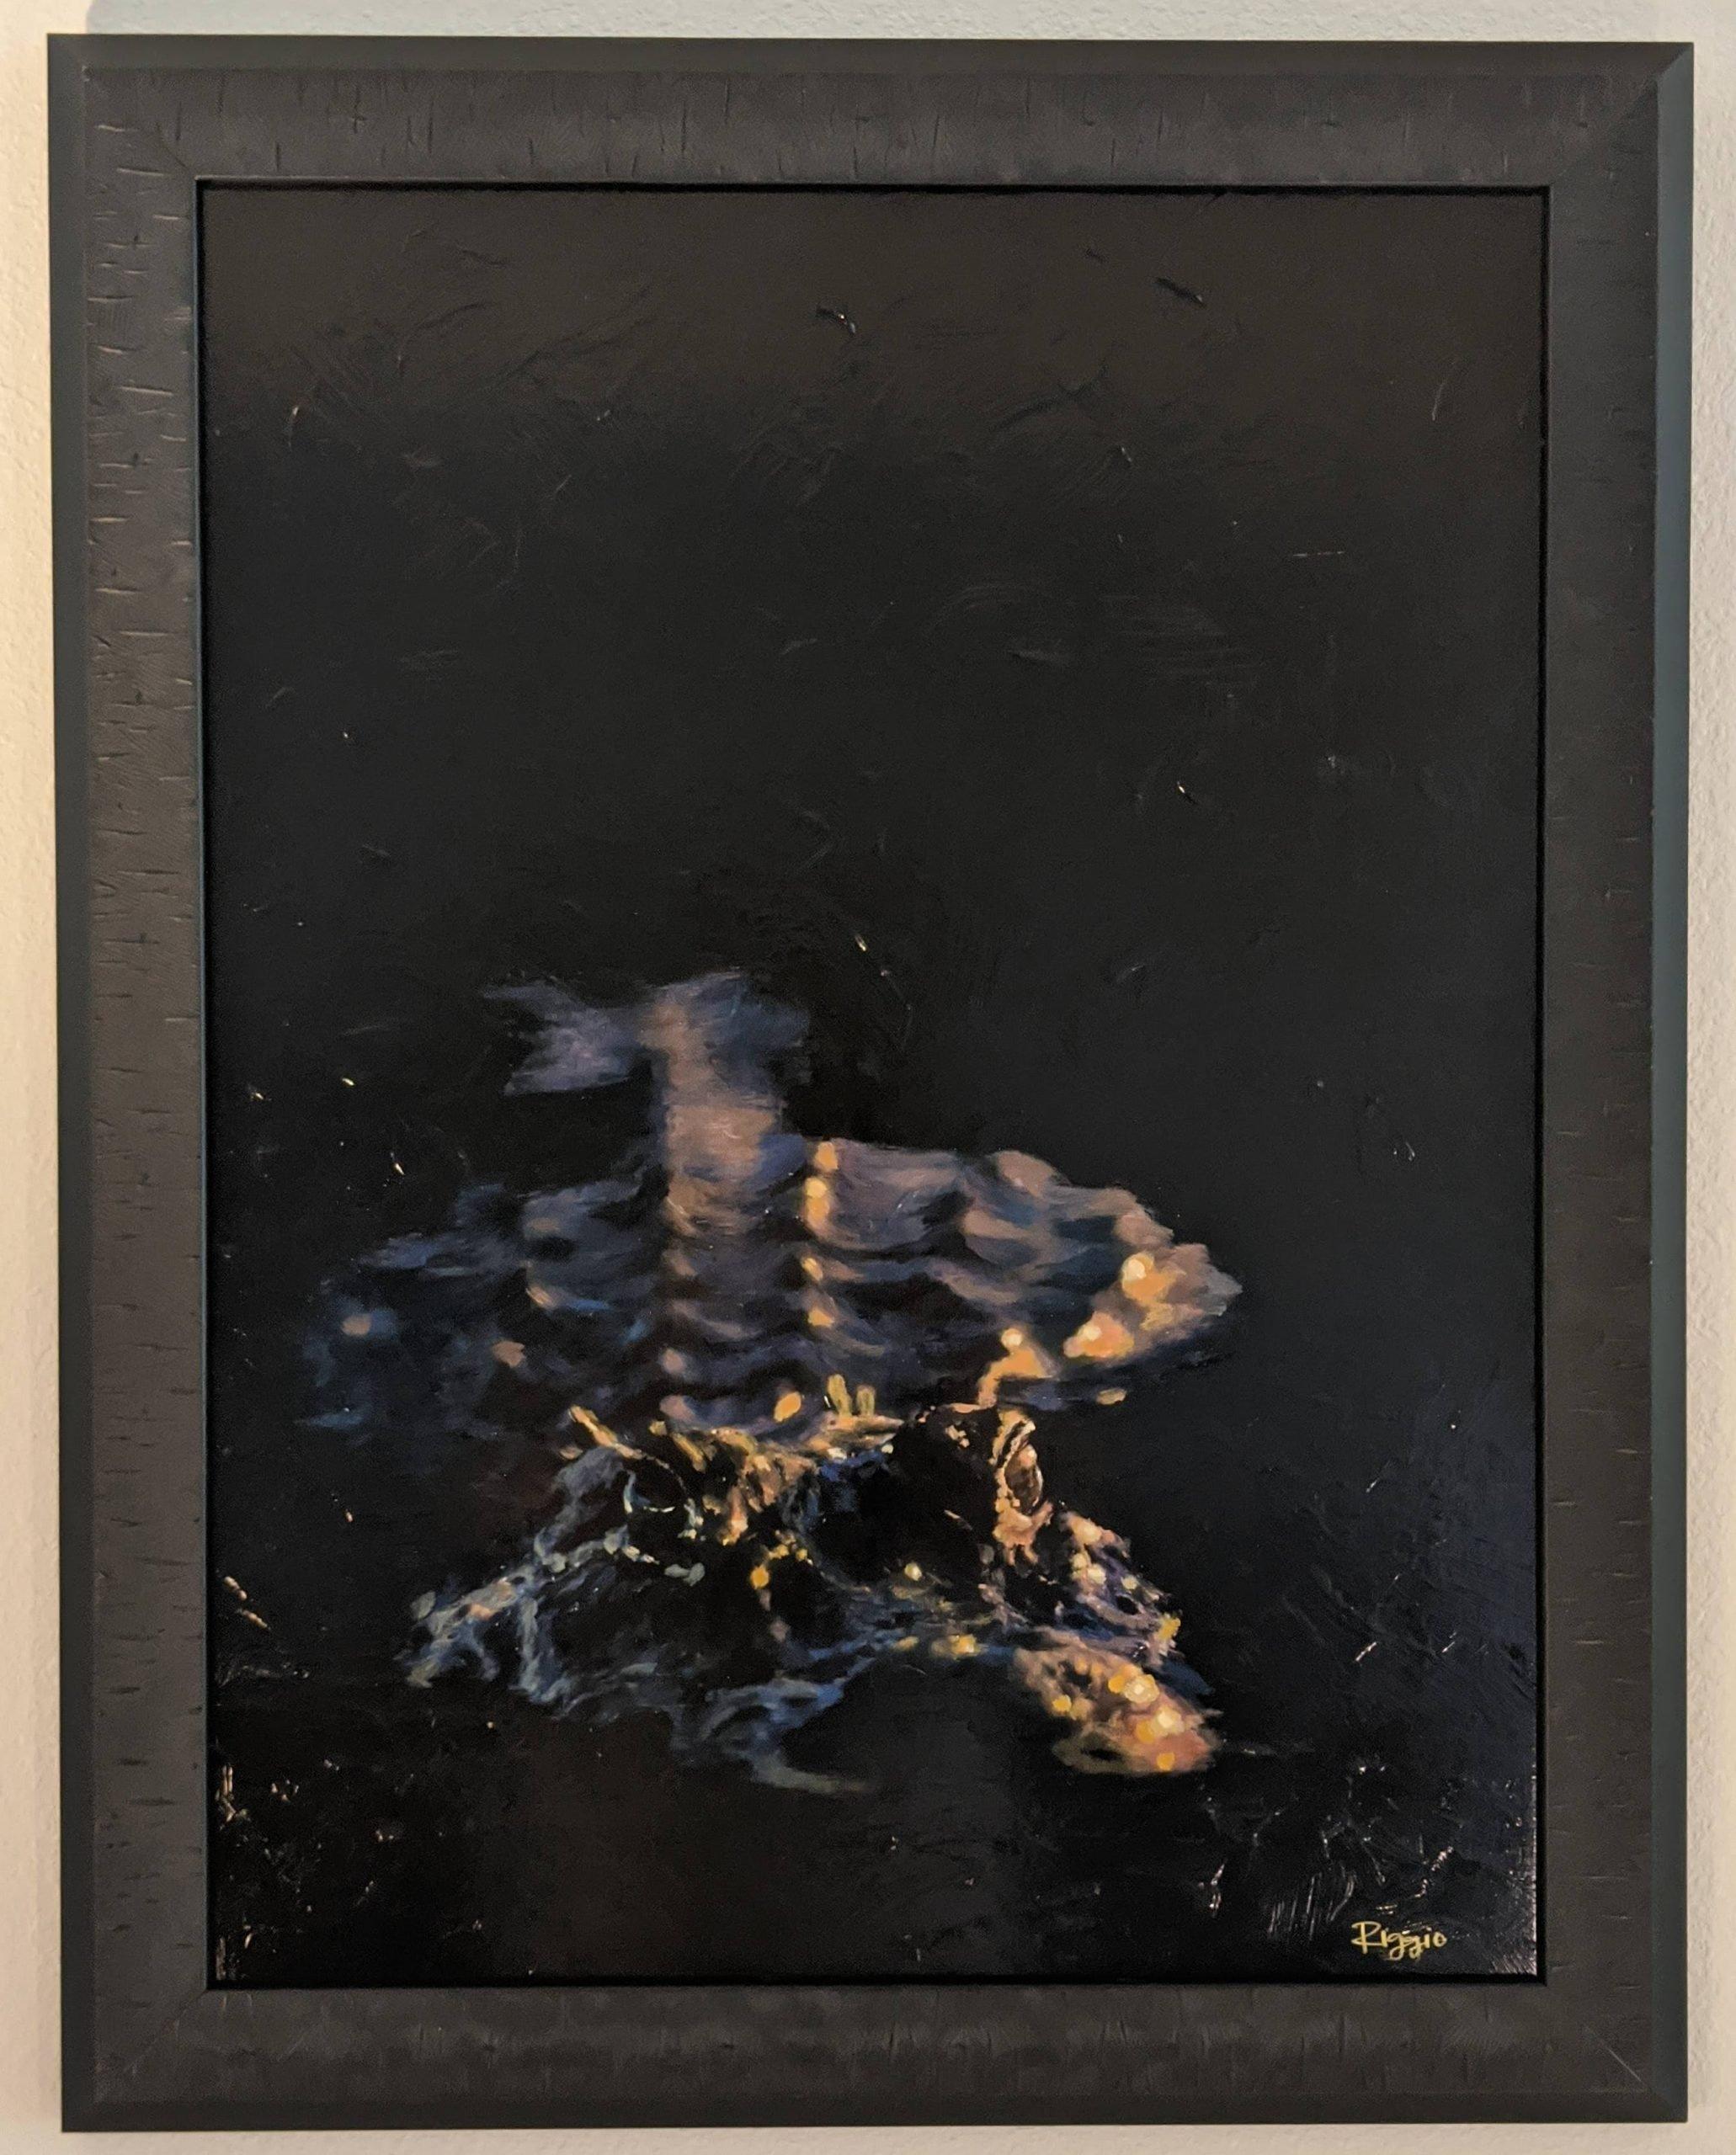 Gator-III-2020-18x24-4.jpg